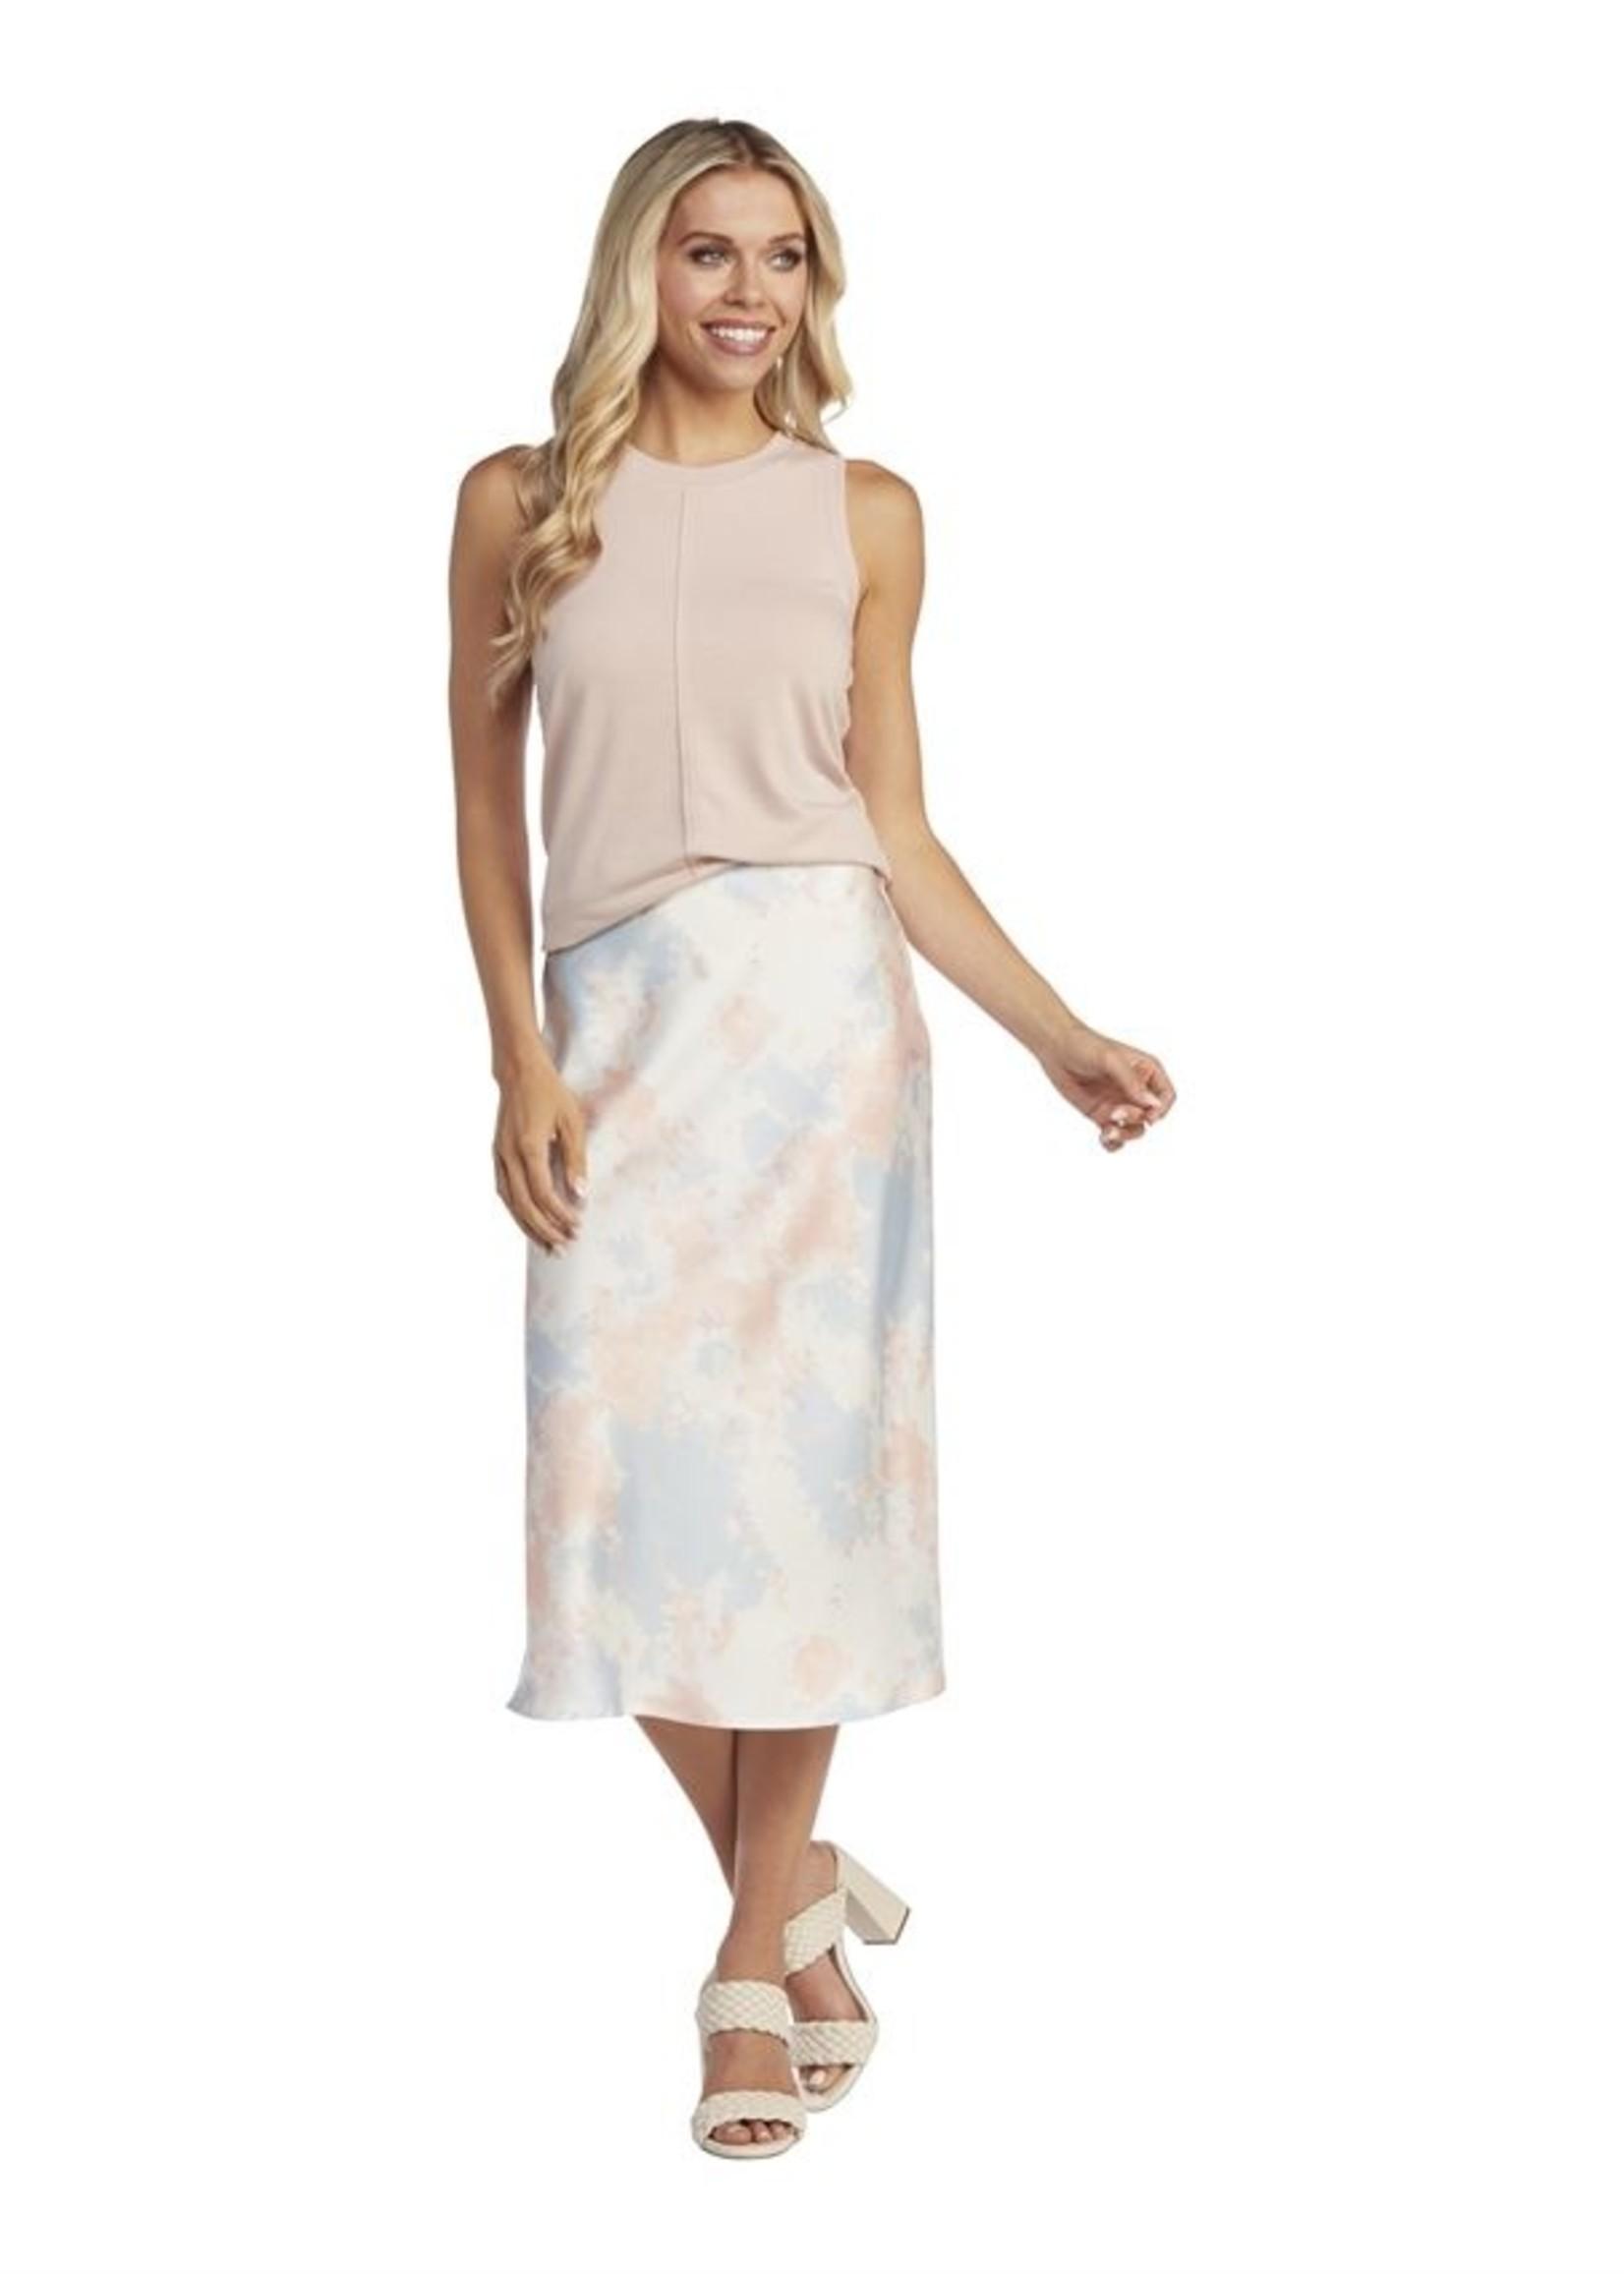 Elitaire Boutique Anya Tie Dye Midi Skirt